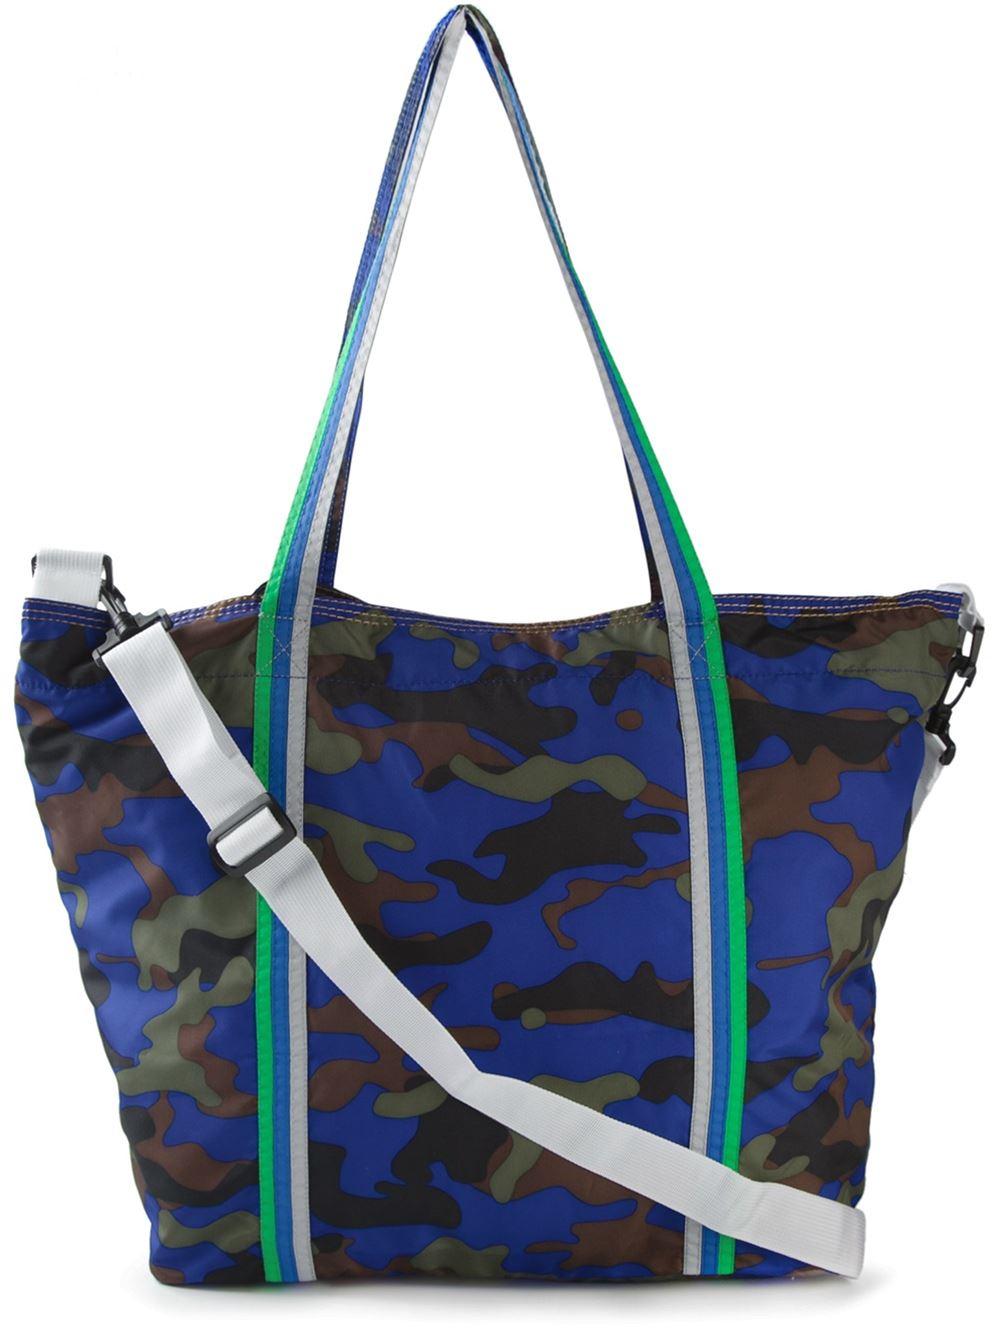 0cde7d434a89 Soft Leather Satchel Bags 2019